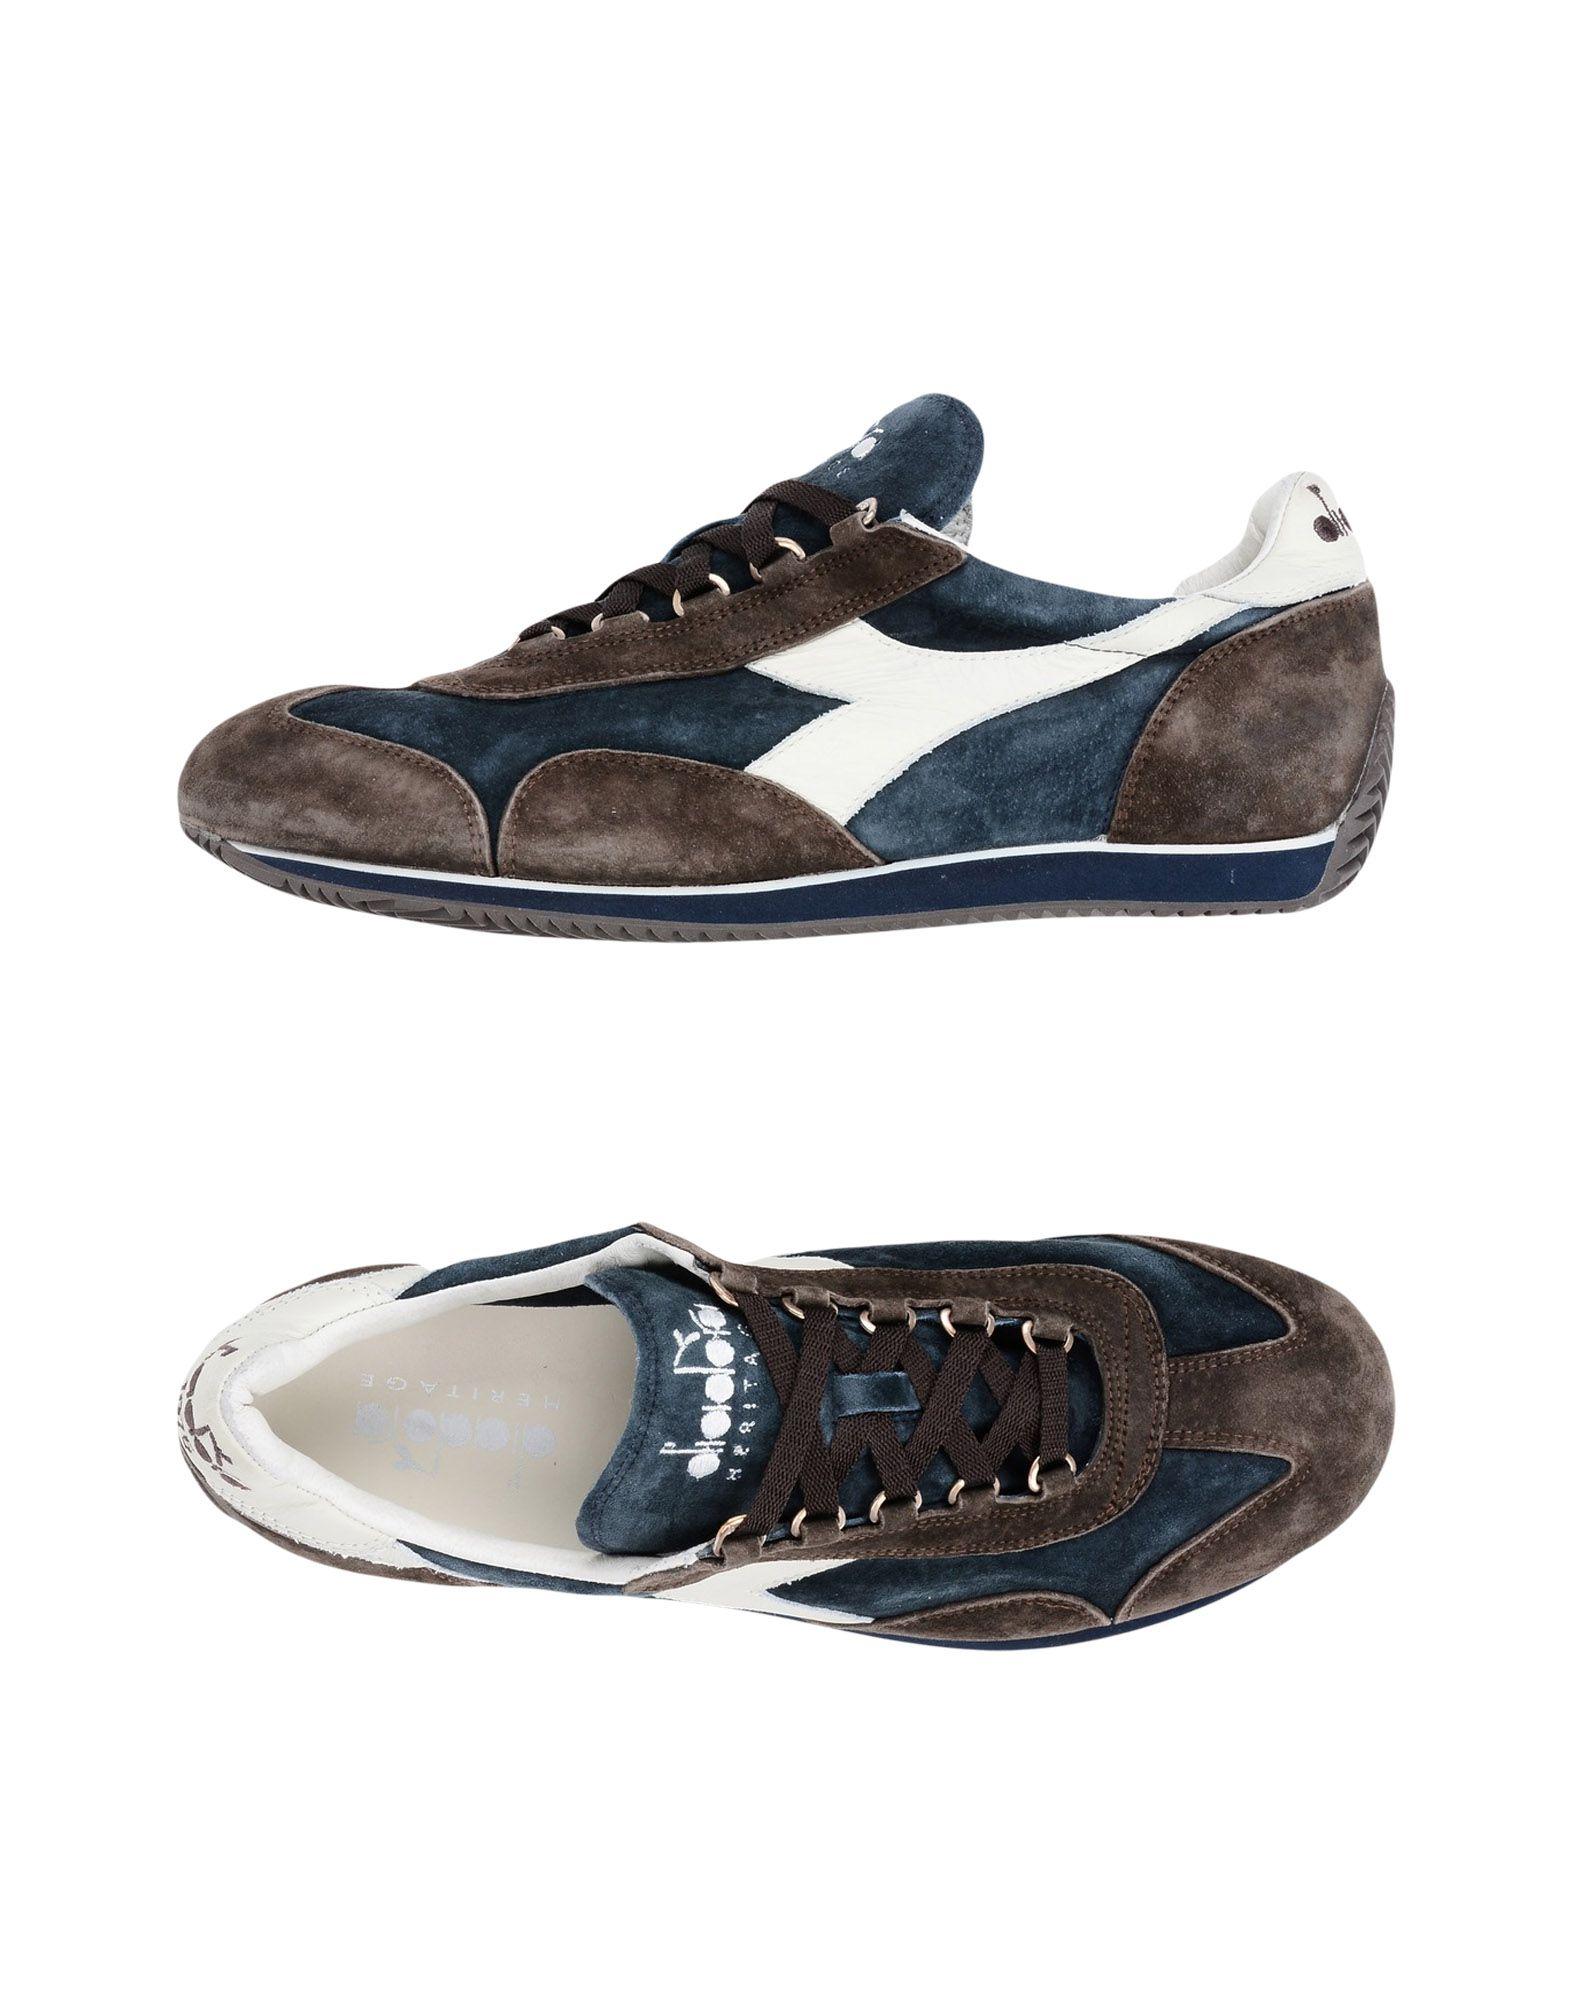 Sneakers Diadora Heritage Equipe S. Sw - Uomo - 11328465UR